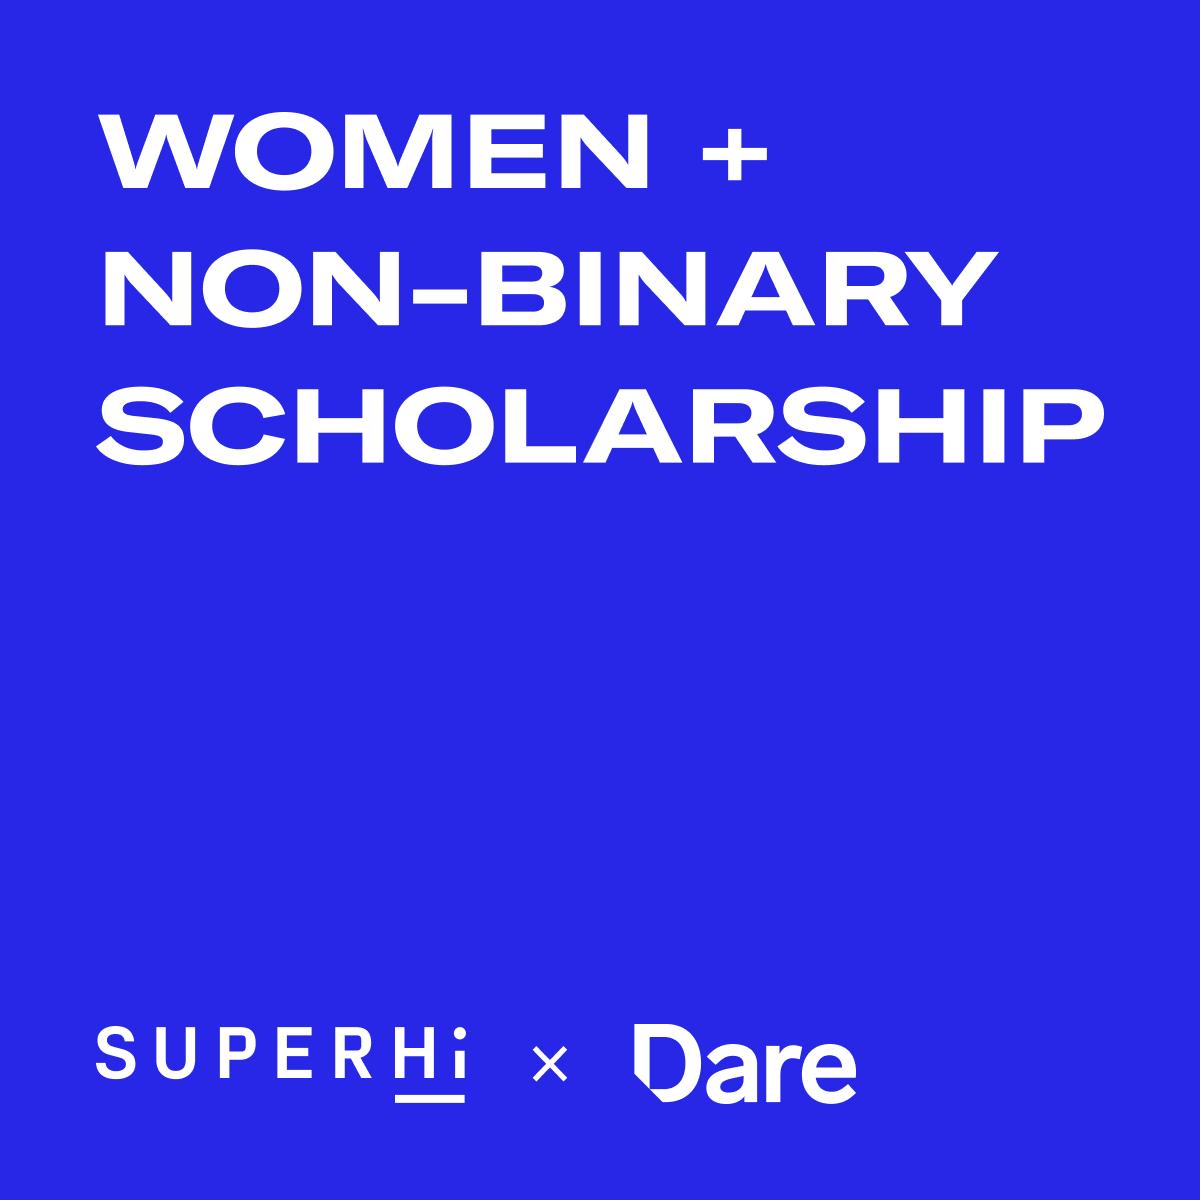 superhi-dare-blue-sq.jpg